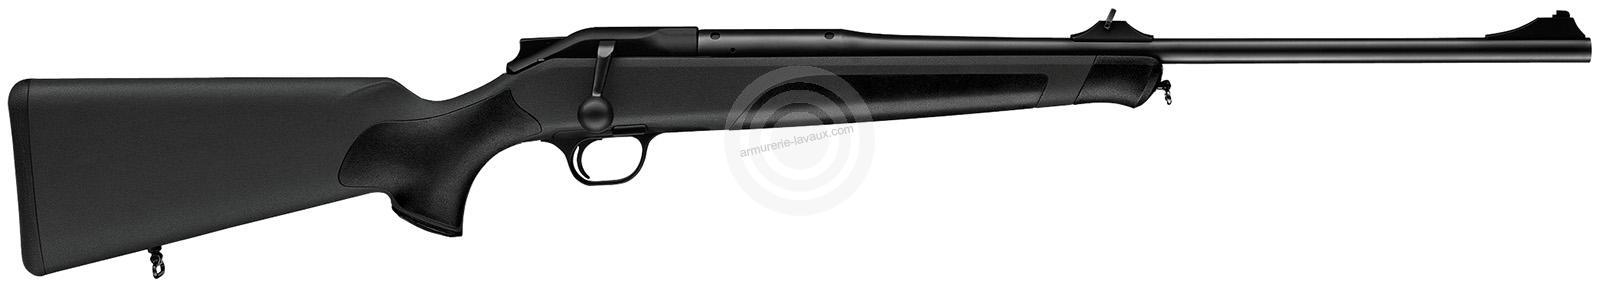 BLASER R8 Professionnal Verte cal.7mm Rem Mag